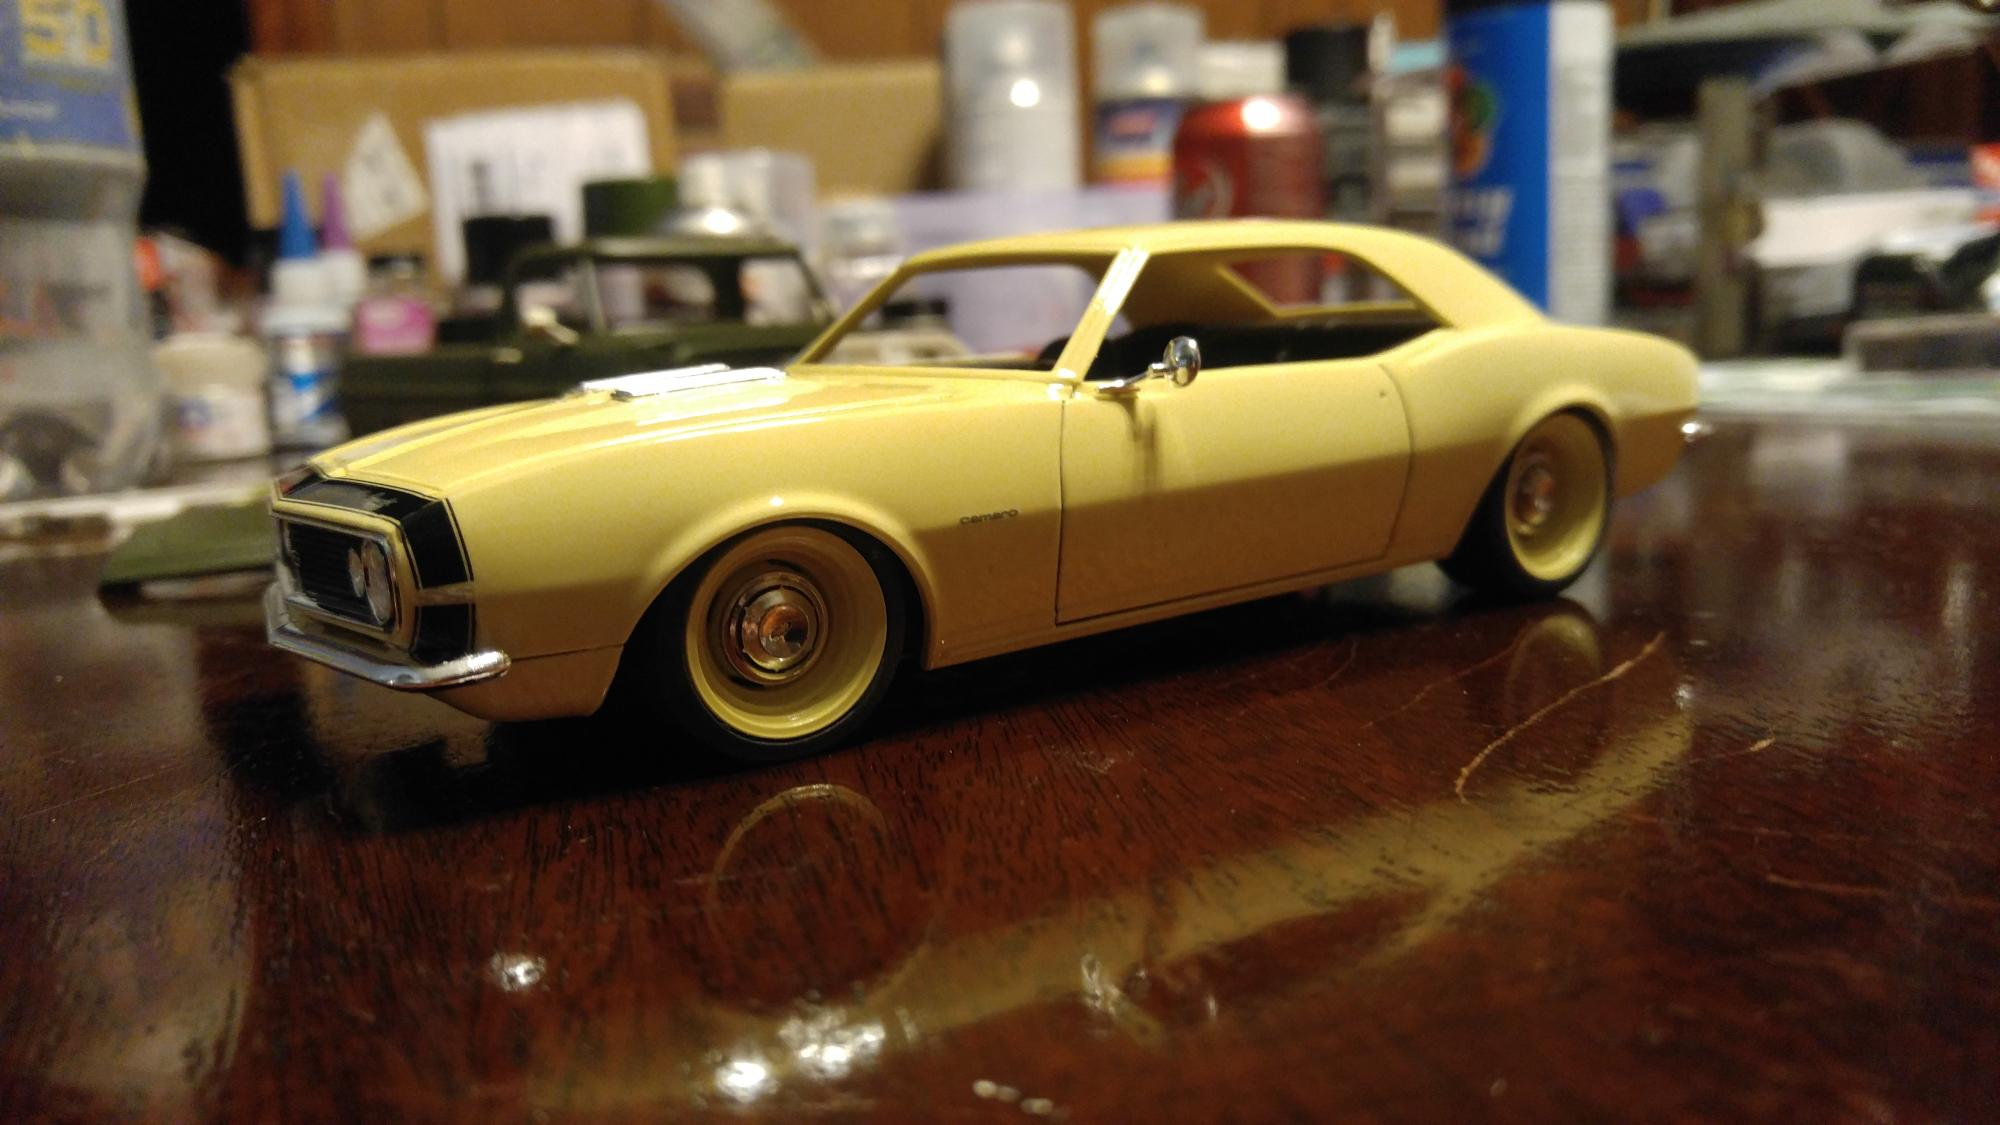 Revell 67 Camaro Updated 3 30 16 On The Workbench